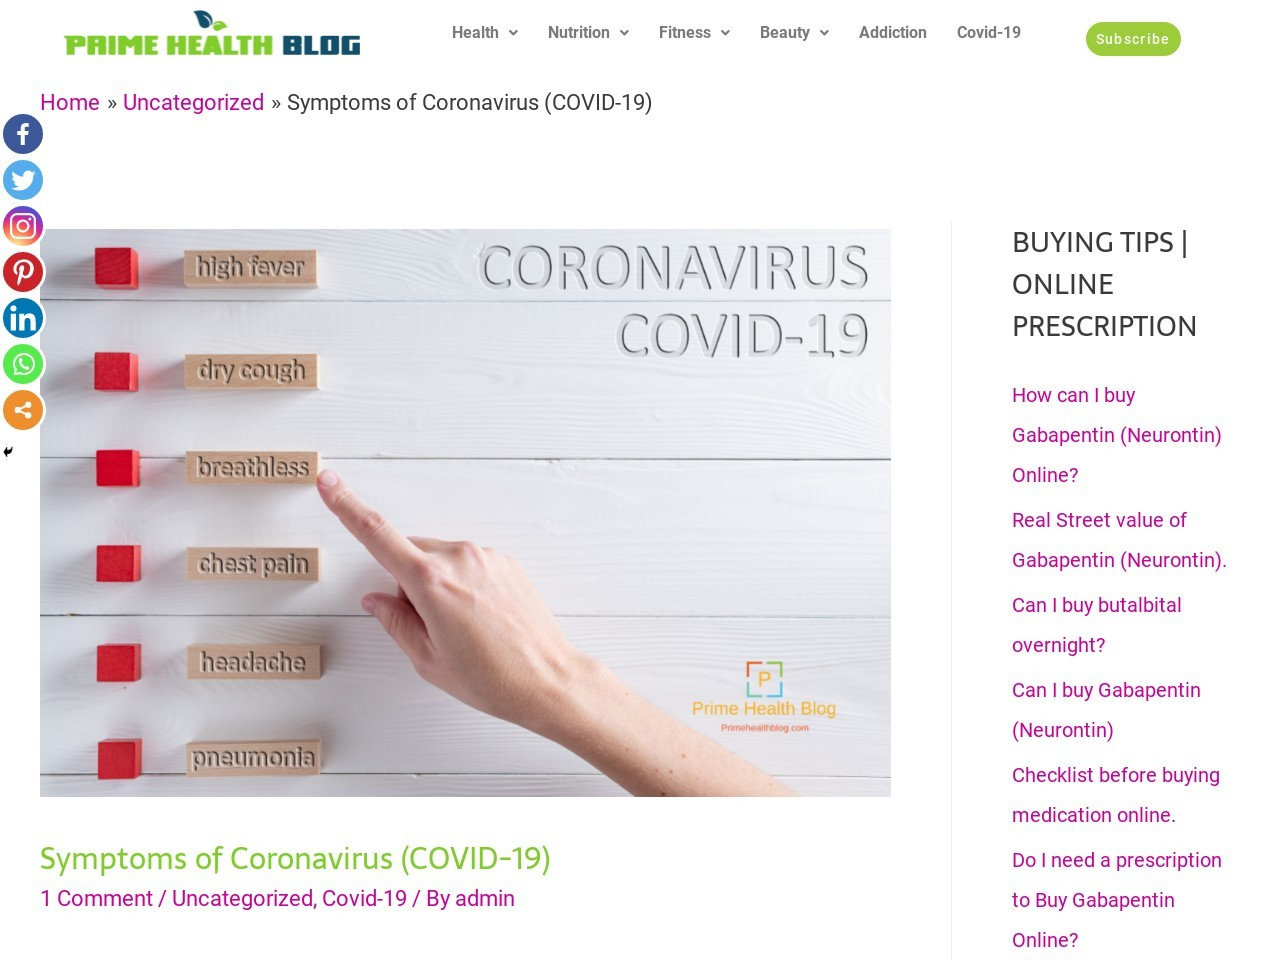 Symptoms of Coronavirus (COVID-19)